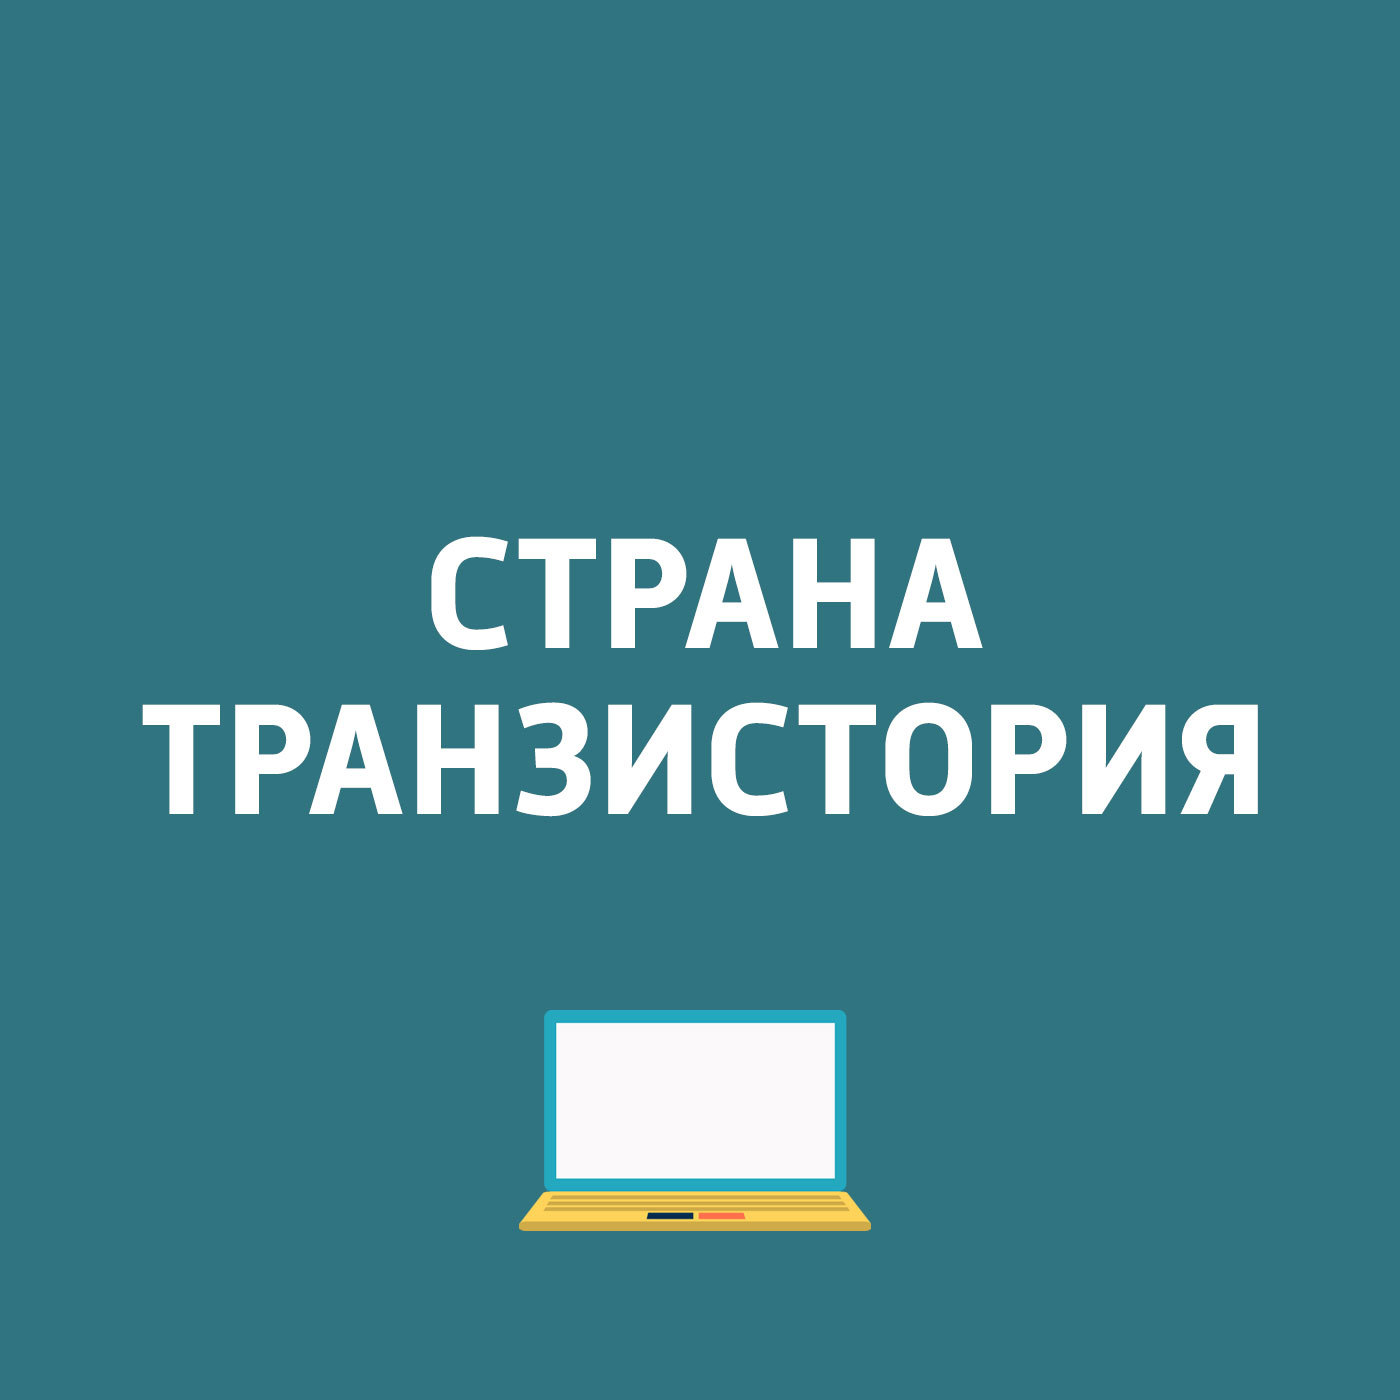 Картаев Павел Самые упоминаемые бренды Mobile World Congress бренды